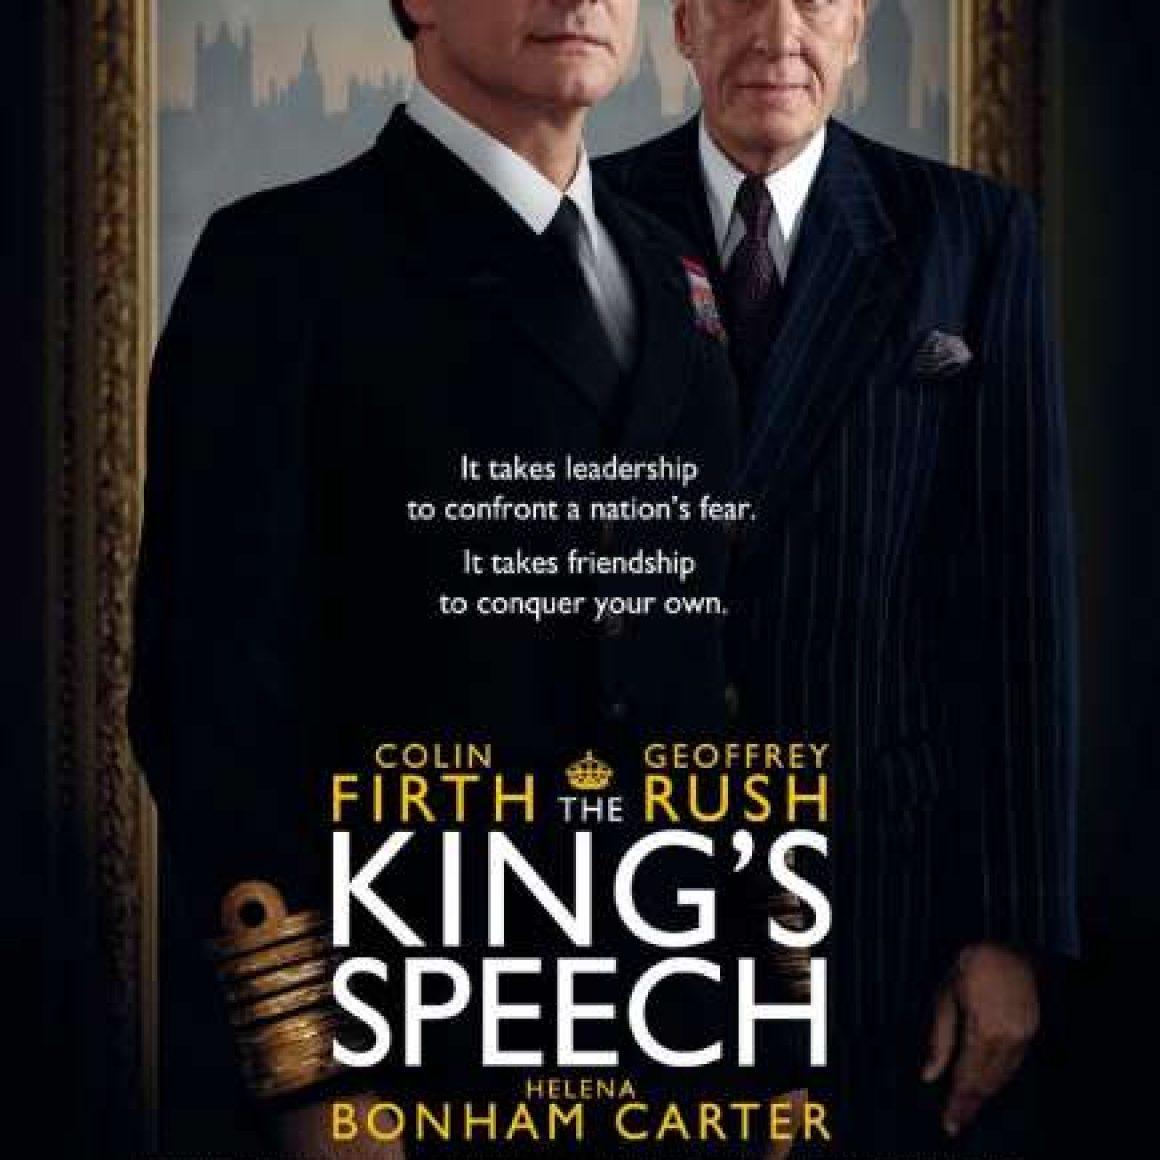 5f2a674cd1dc3_the_kings_speech 02 435_627